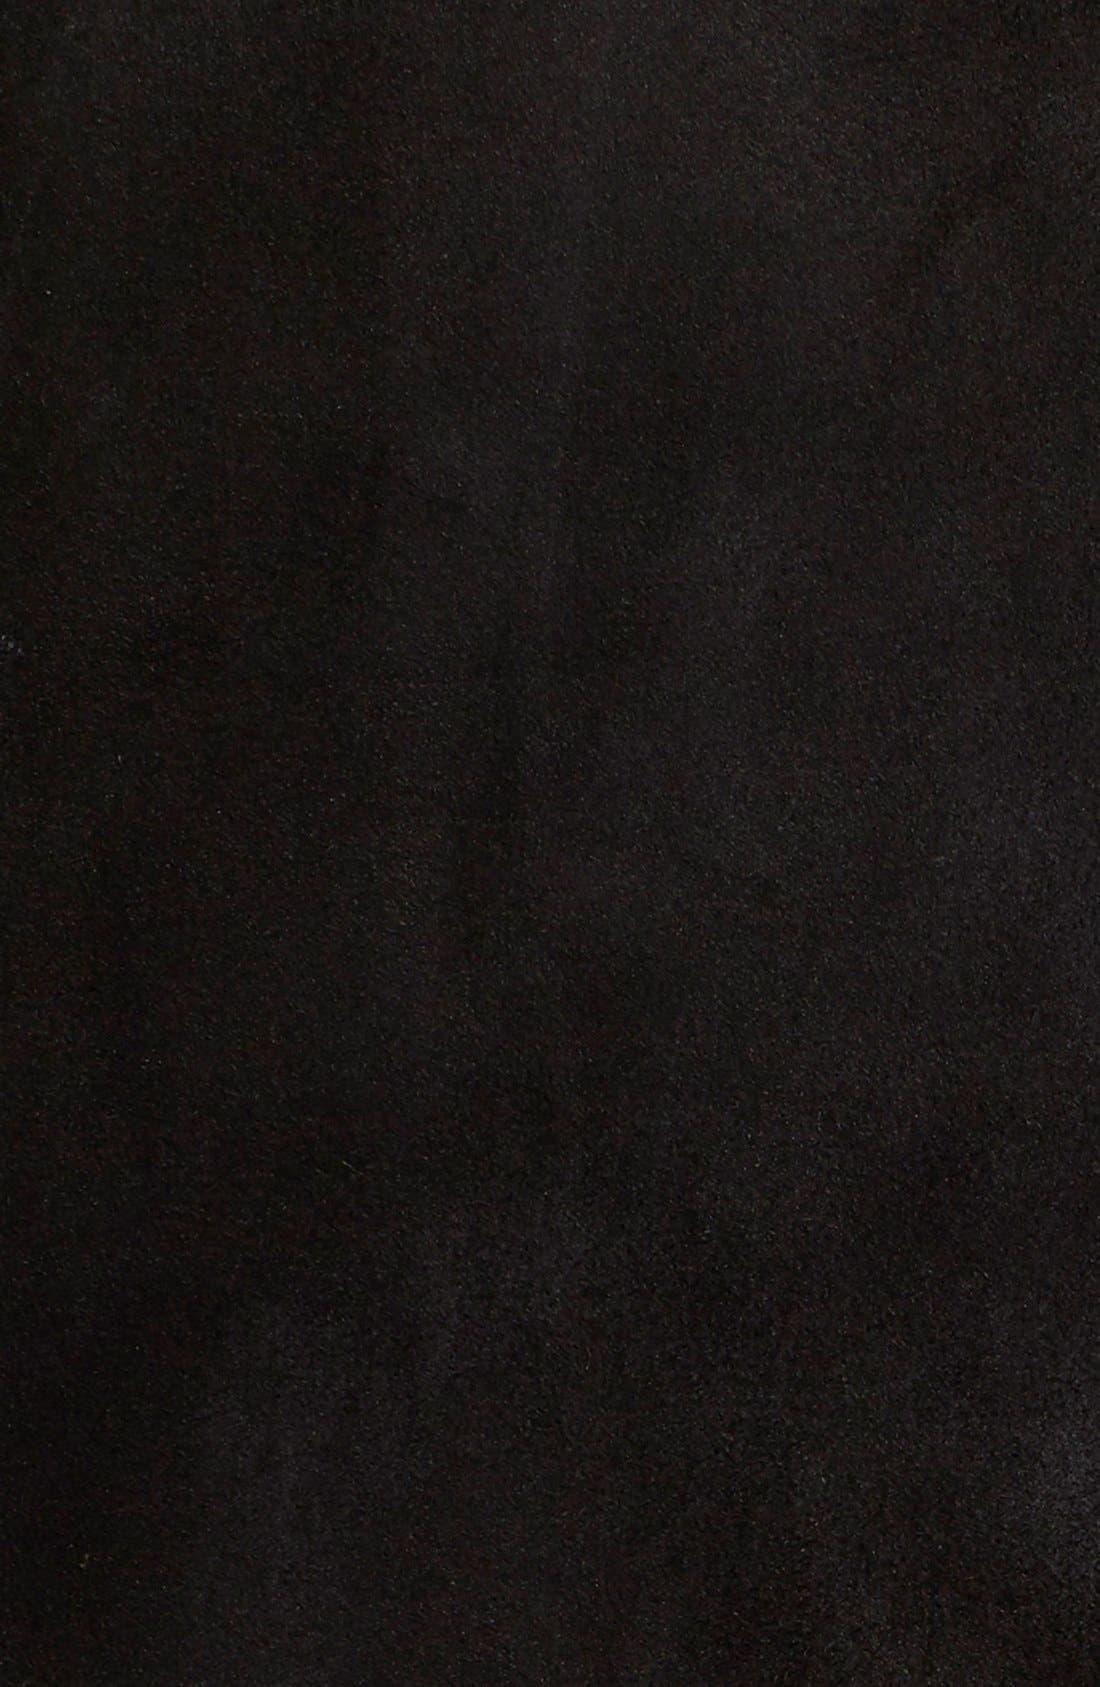 Long Genuine Toscana Shearling Coat,                             Alternate thumbnail 5, color,                             001